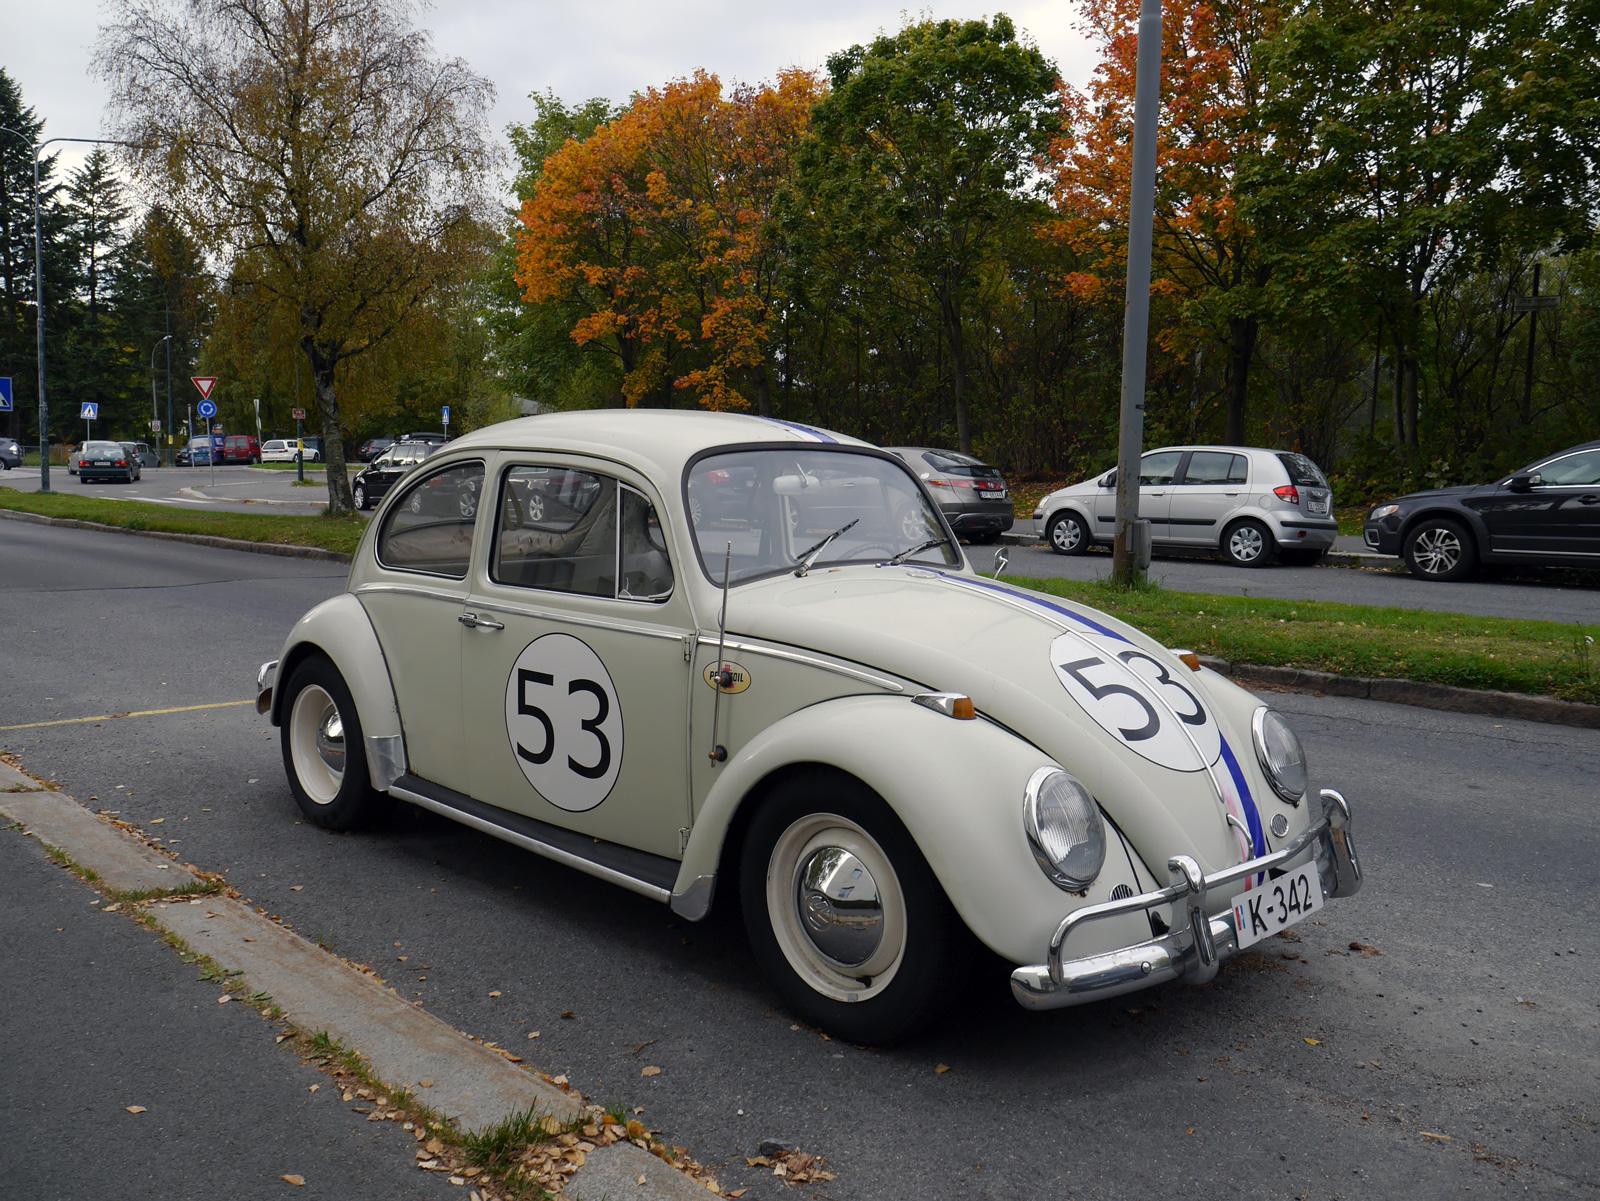 1966 Volkswagen 1300 boble beetle type 1 Oslo